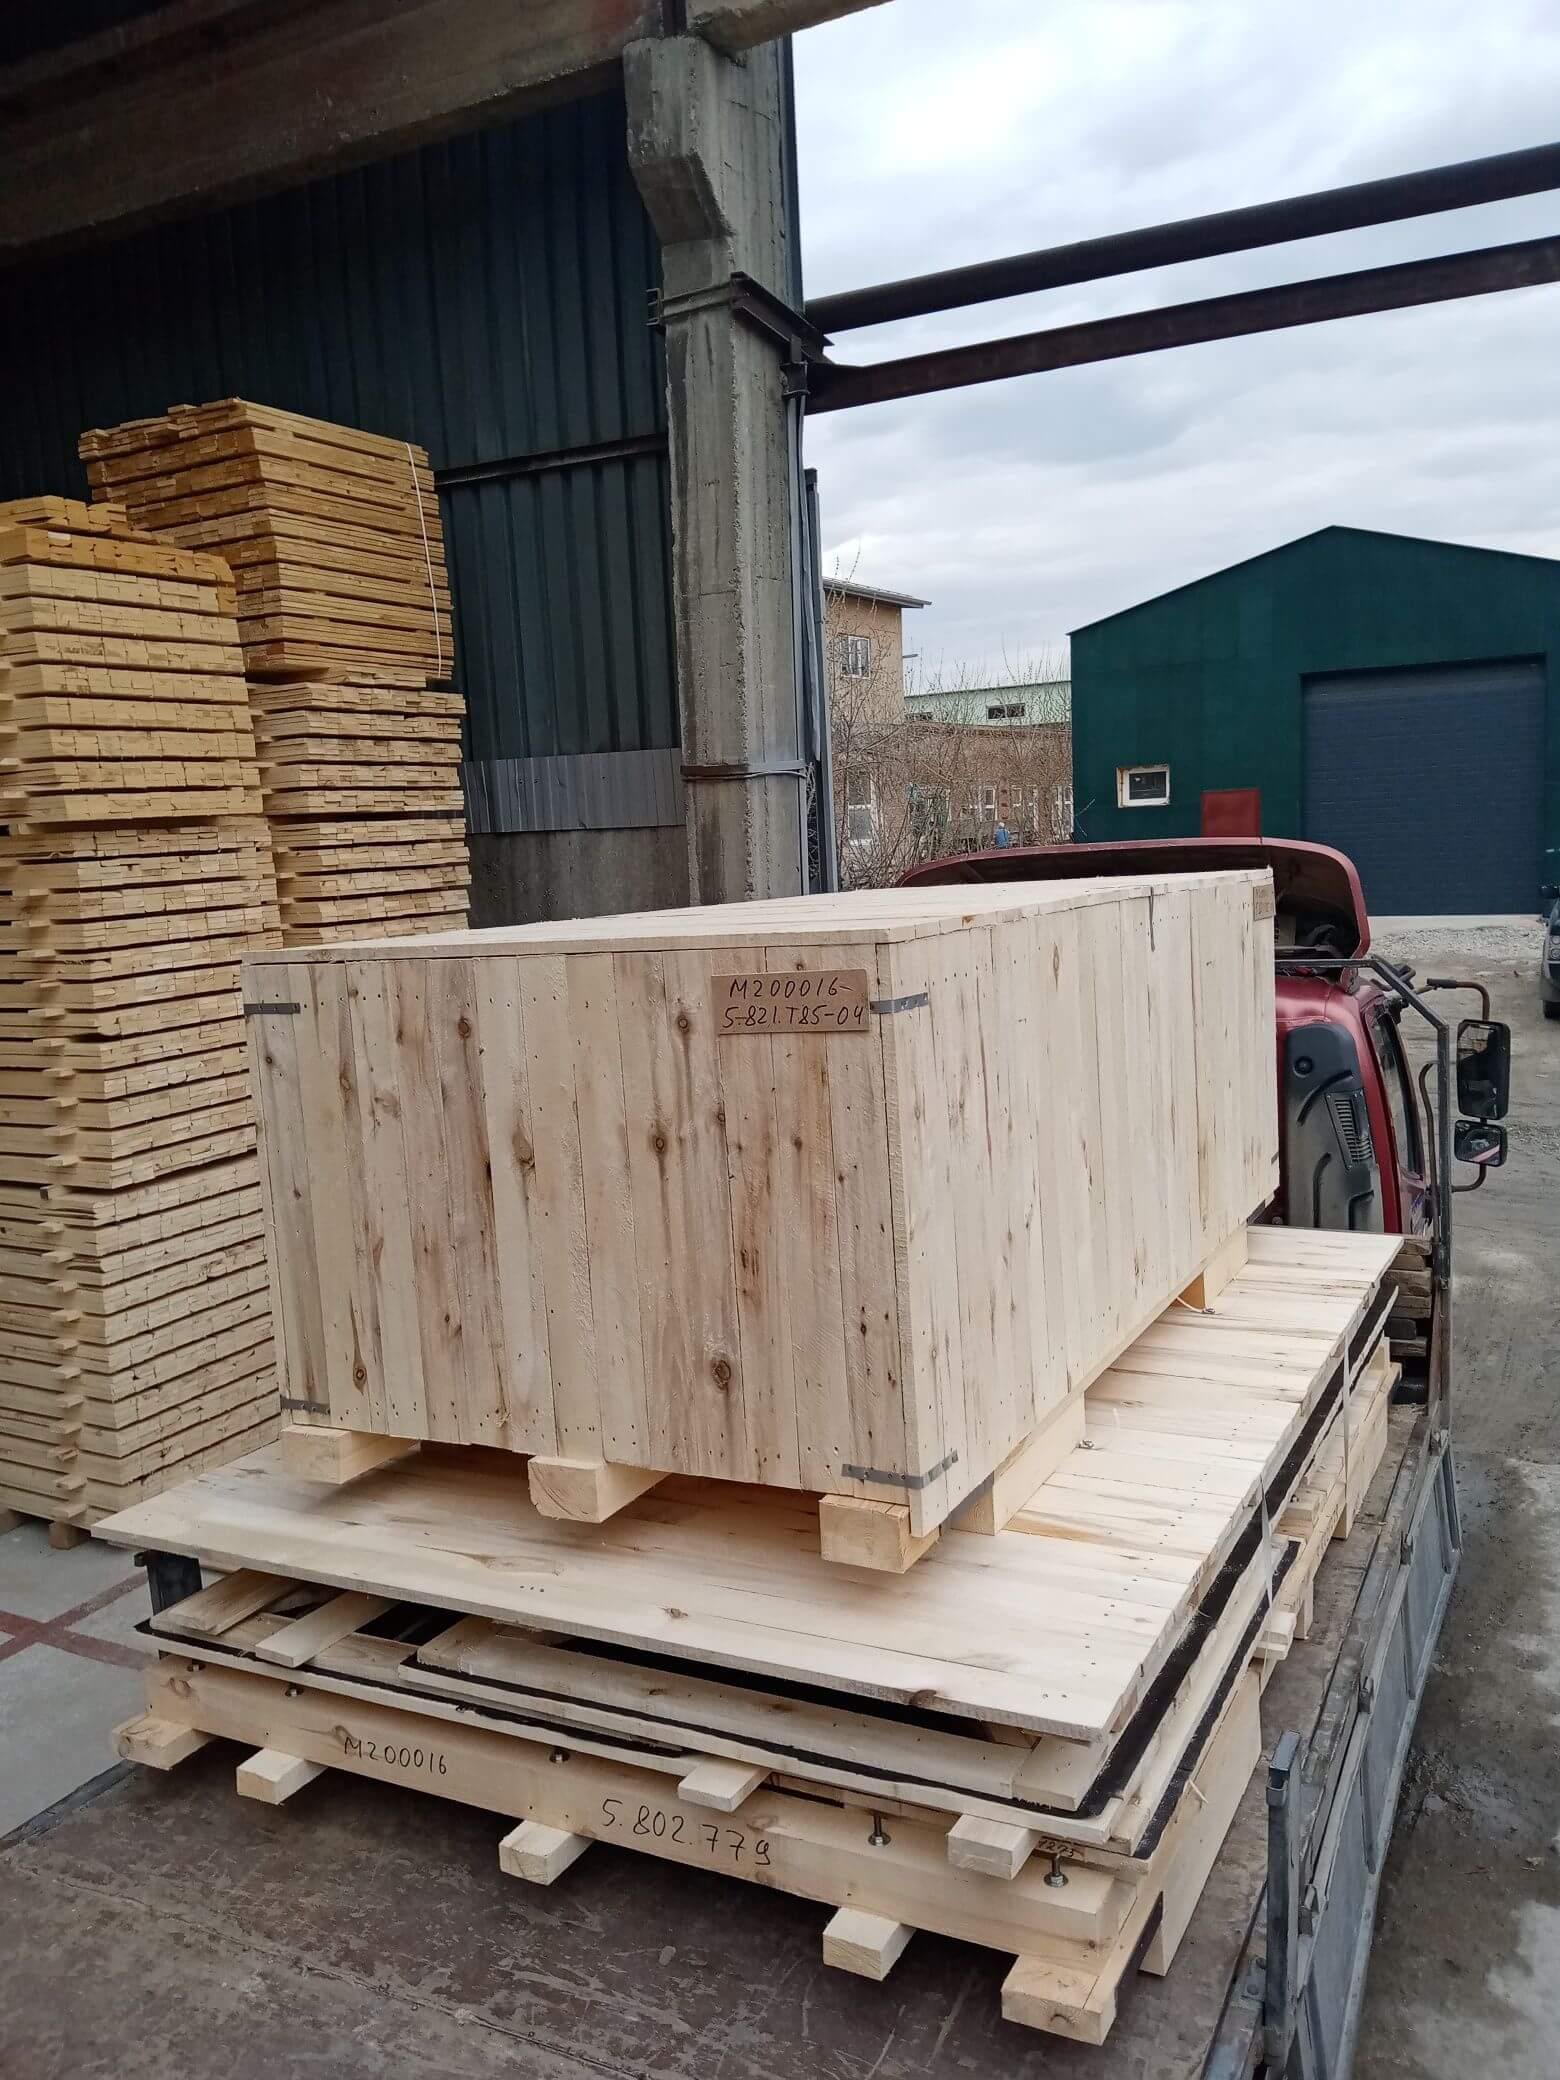 Ящик из фанеры тип III до 35 кг ГОСТ 5959-80